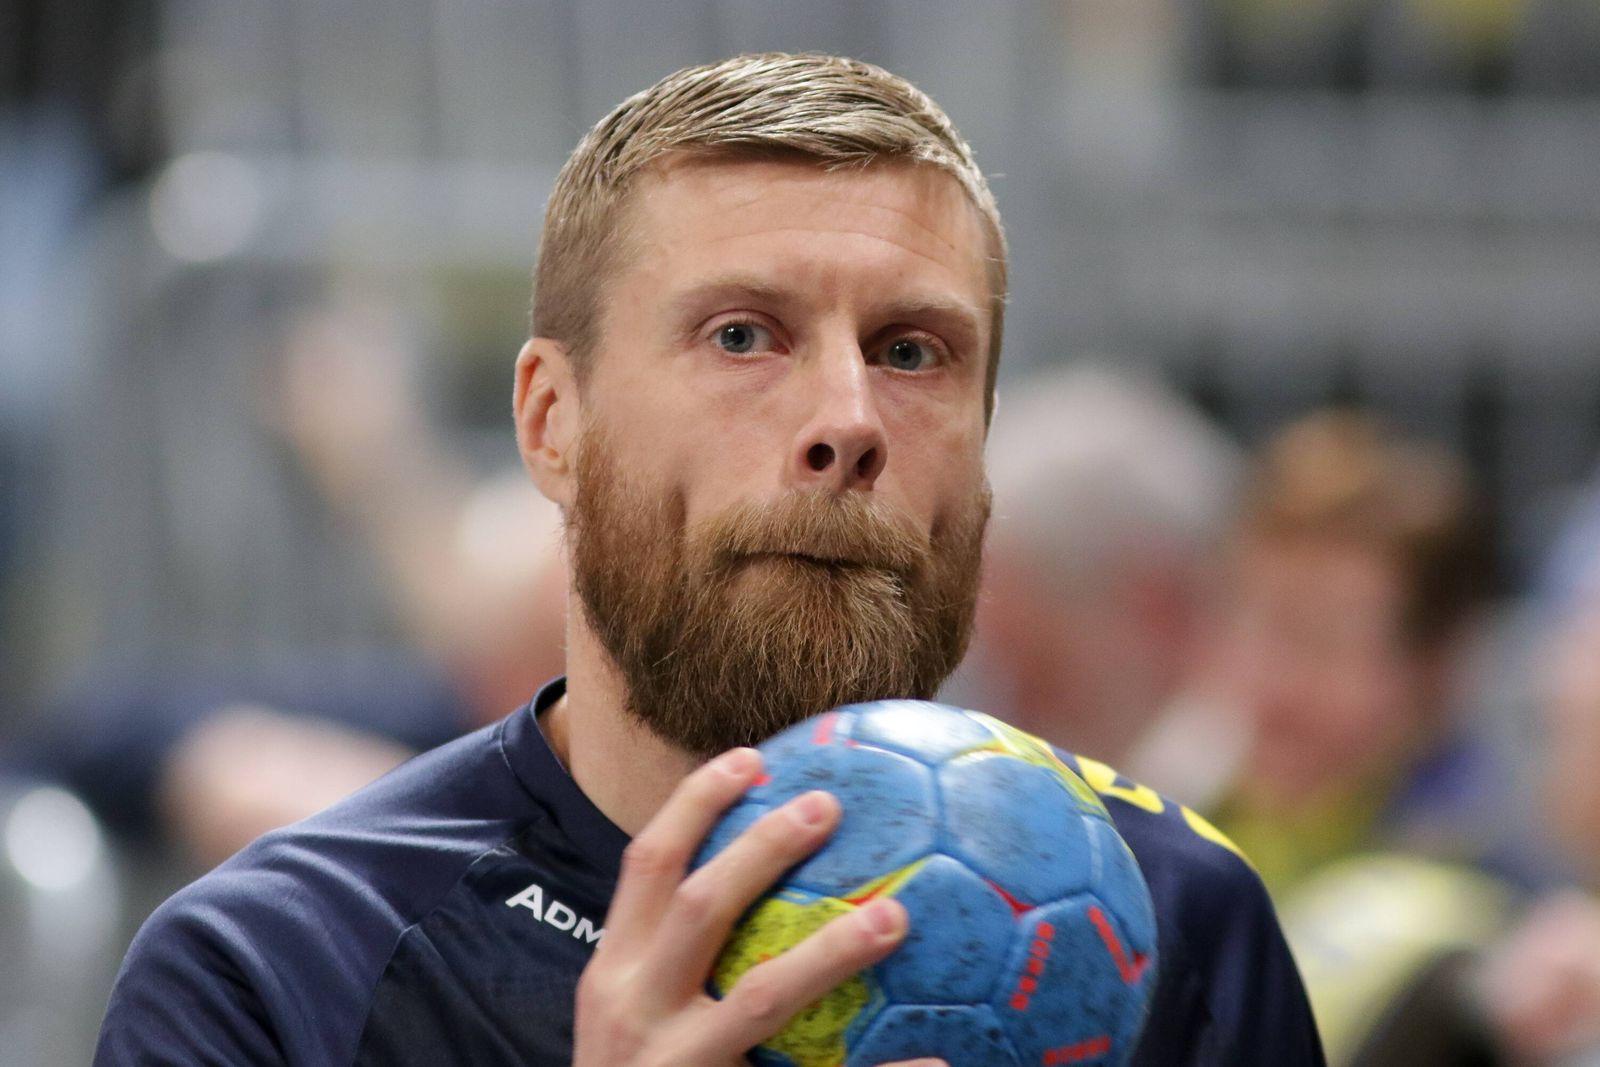 Gudjon Valur Sigurdsson (RNL, 9), Einzelbild, Aktion, Action, Porträt, Portrait, Handball, DKB Bundesliga, Rhein-Neckar